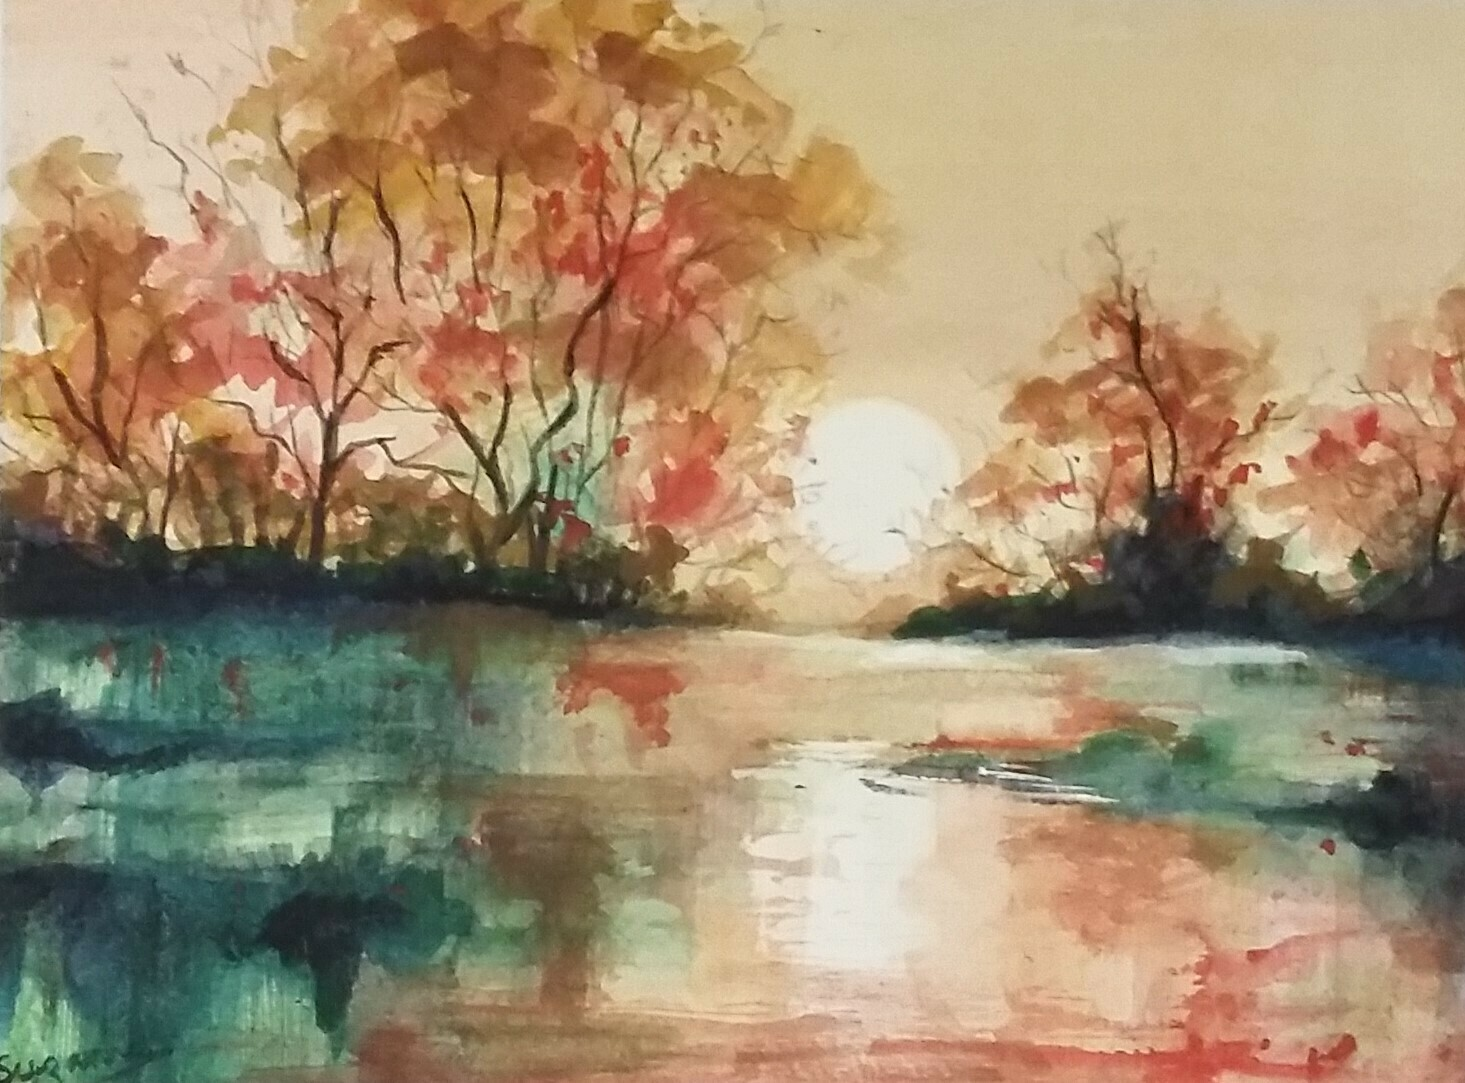 Autumnal English landscape at dawn.